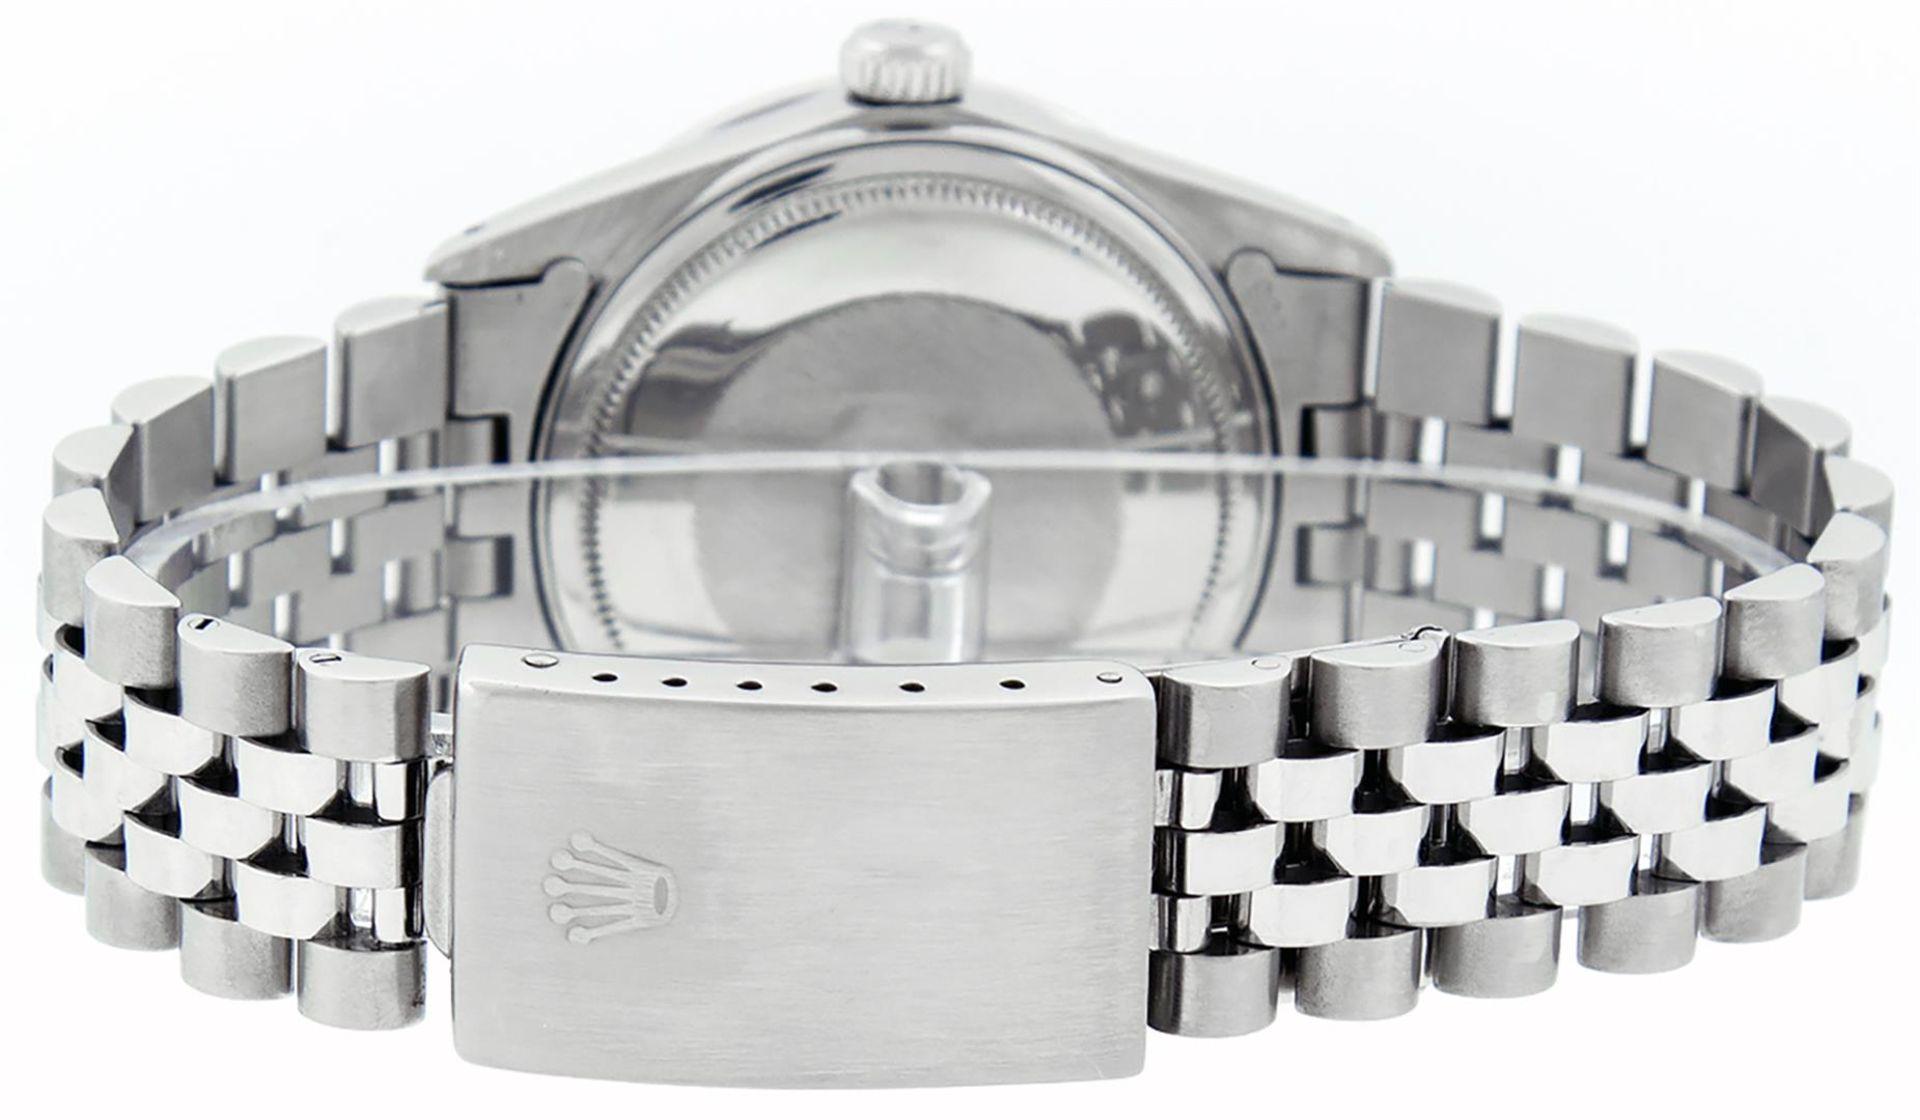 Rolex Mens Stainless Steel White Diamond & Emerald 36MM Datejust Wristwatch - Image 6 of 9